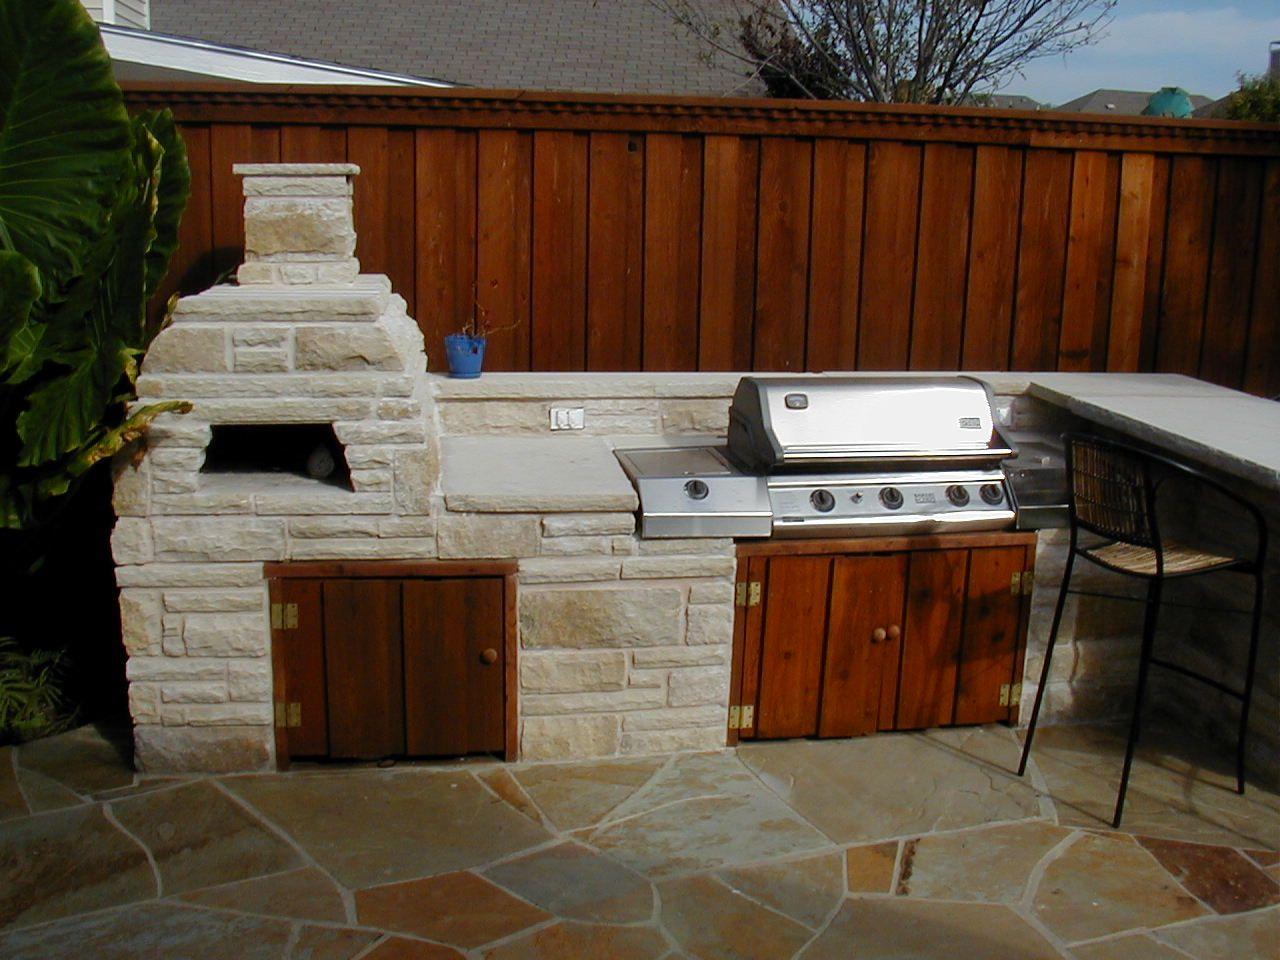 bbq pizza oven - Google Search | Backyard pizza oven ...